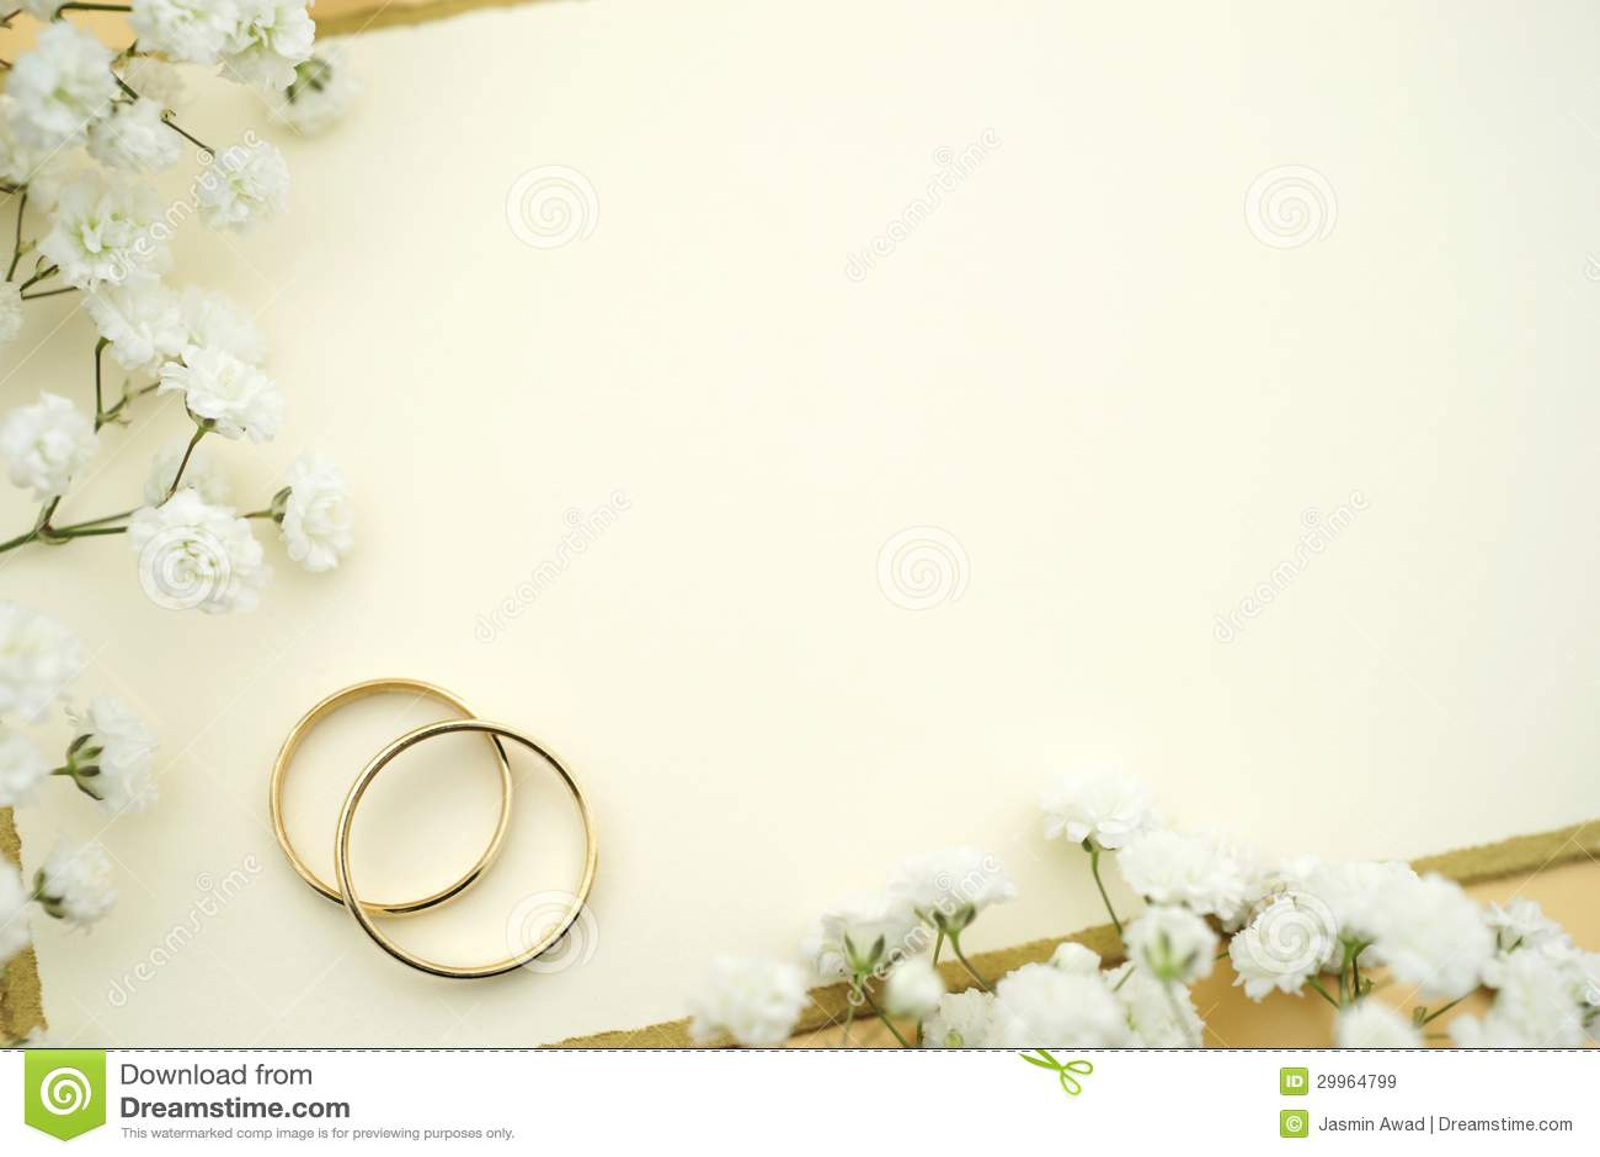 Wedding Invite stock image Image of jewelry wedding 29964799